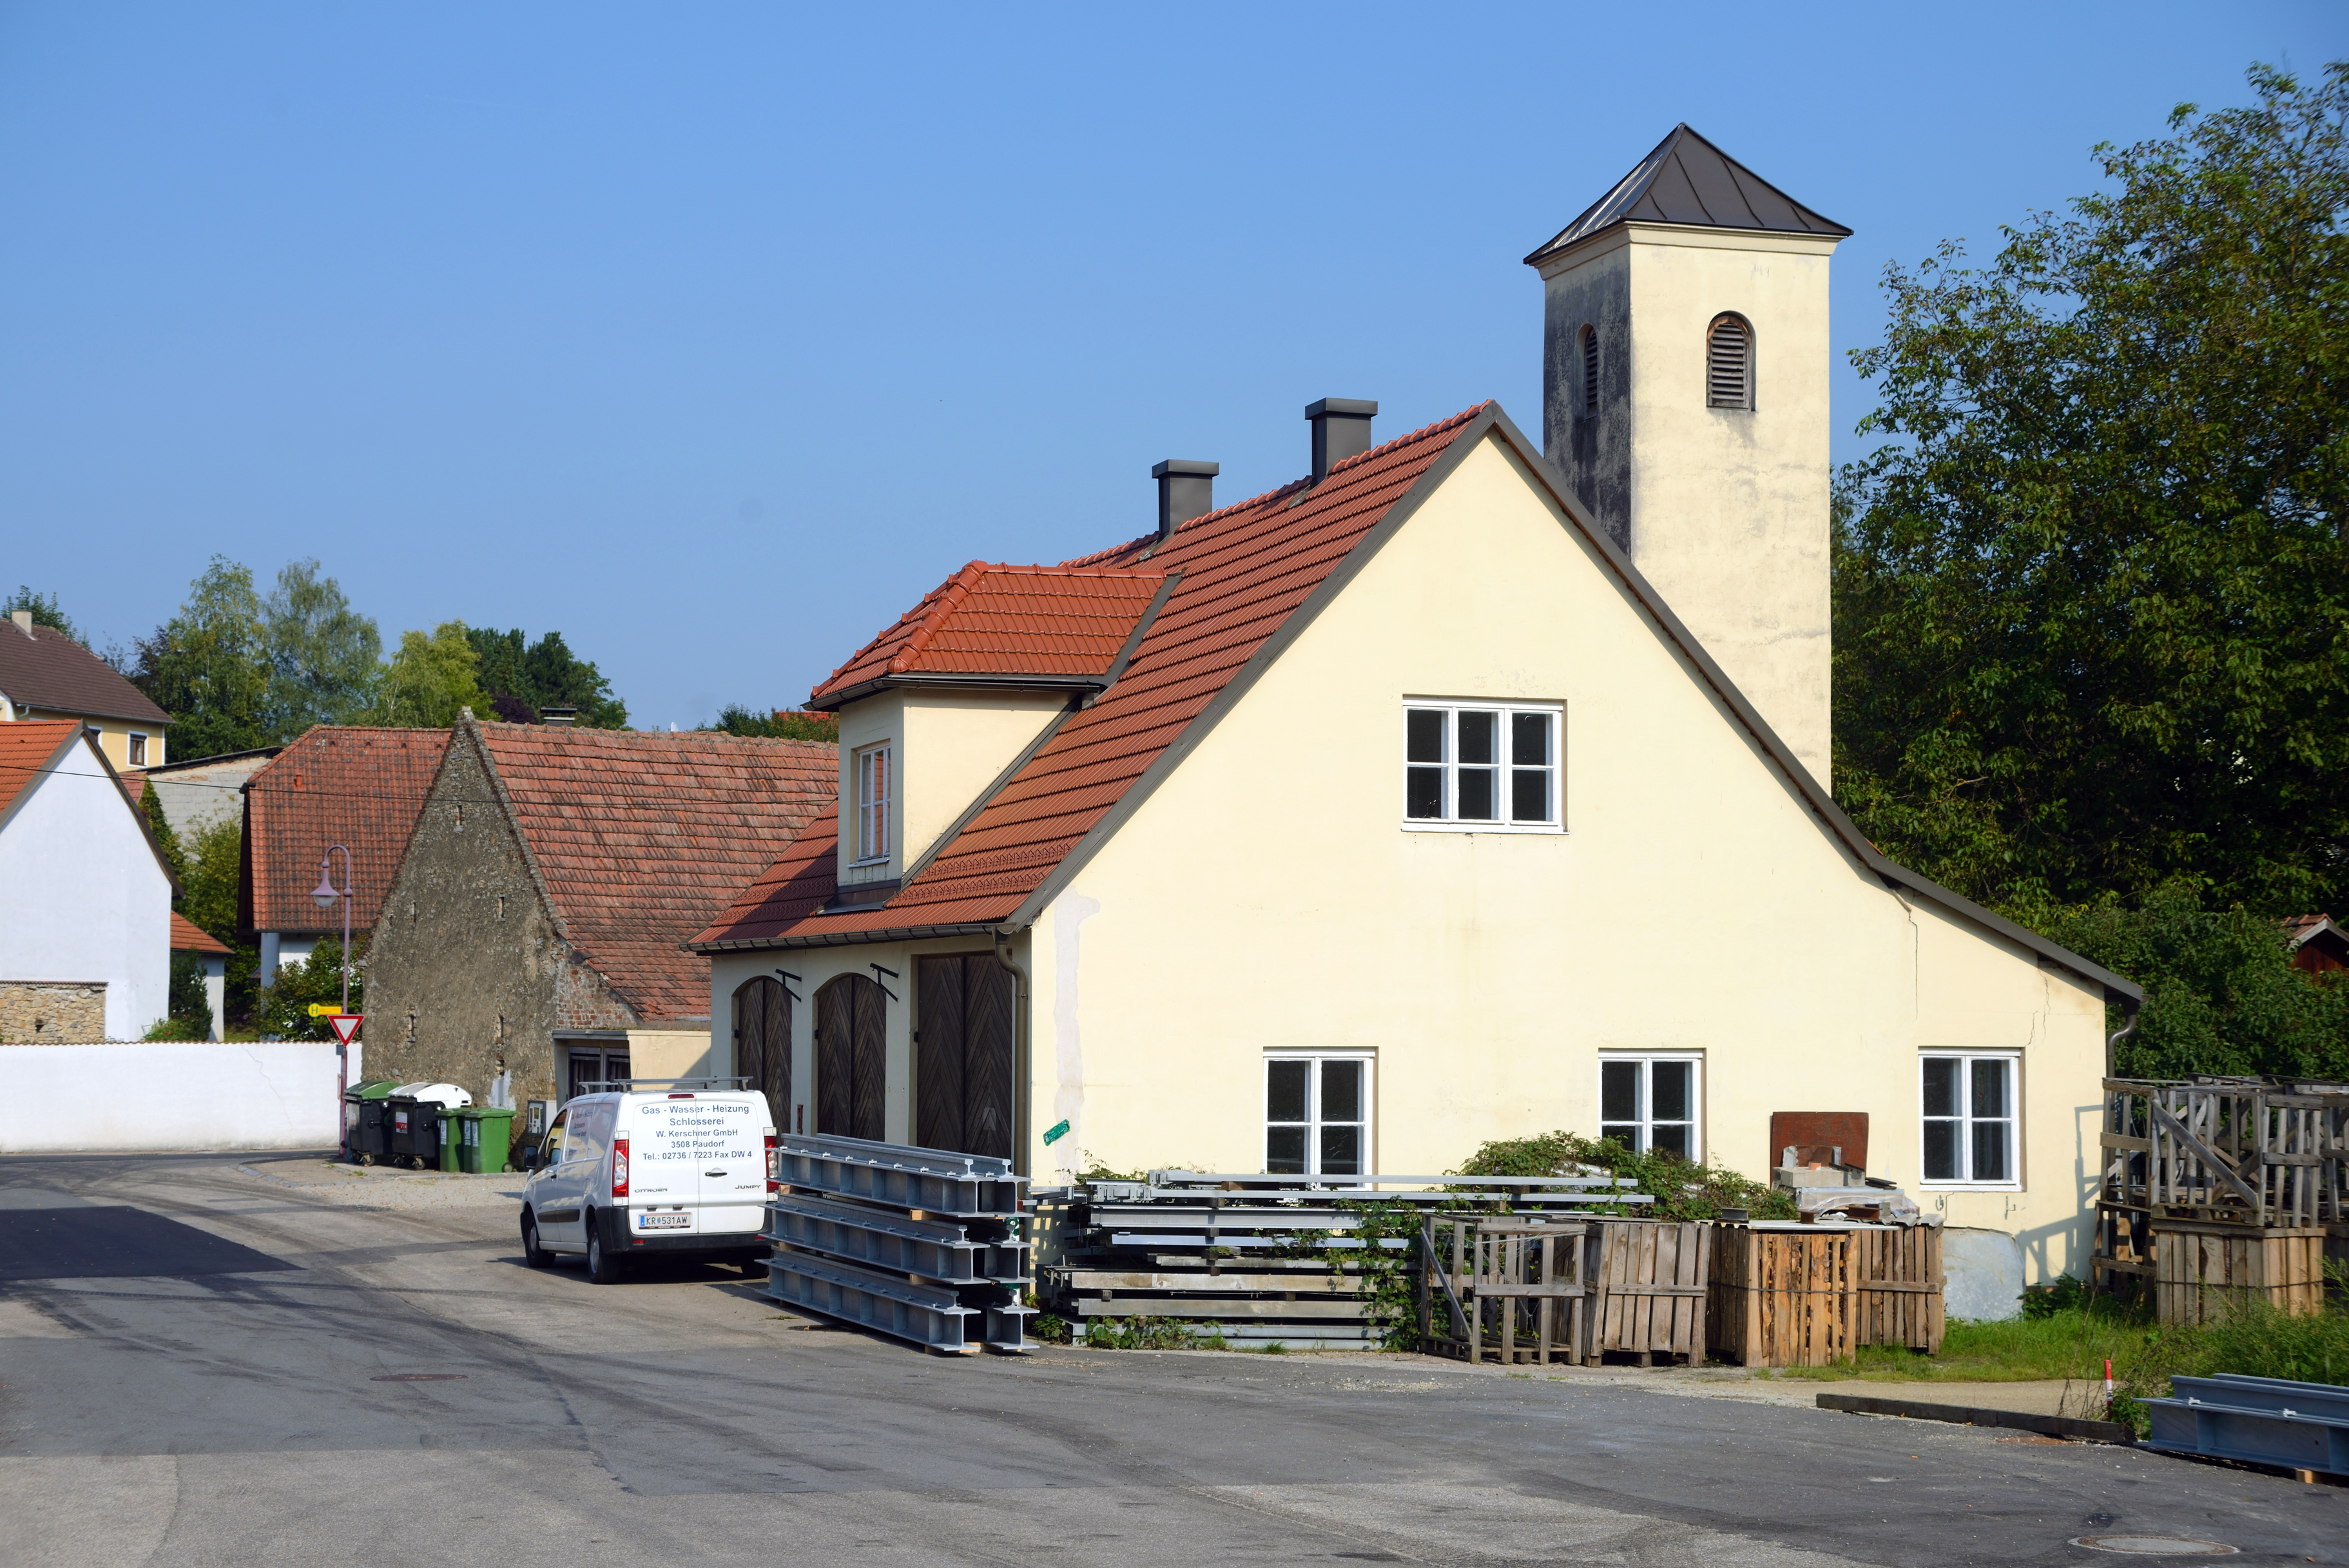 File Paudorf Feuerwehr Geratehaus Jpg Wikimedia Commons